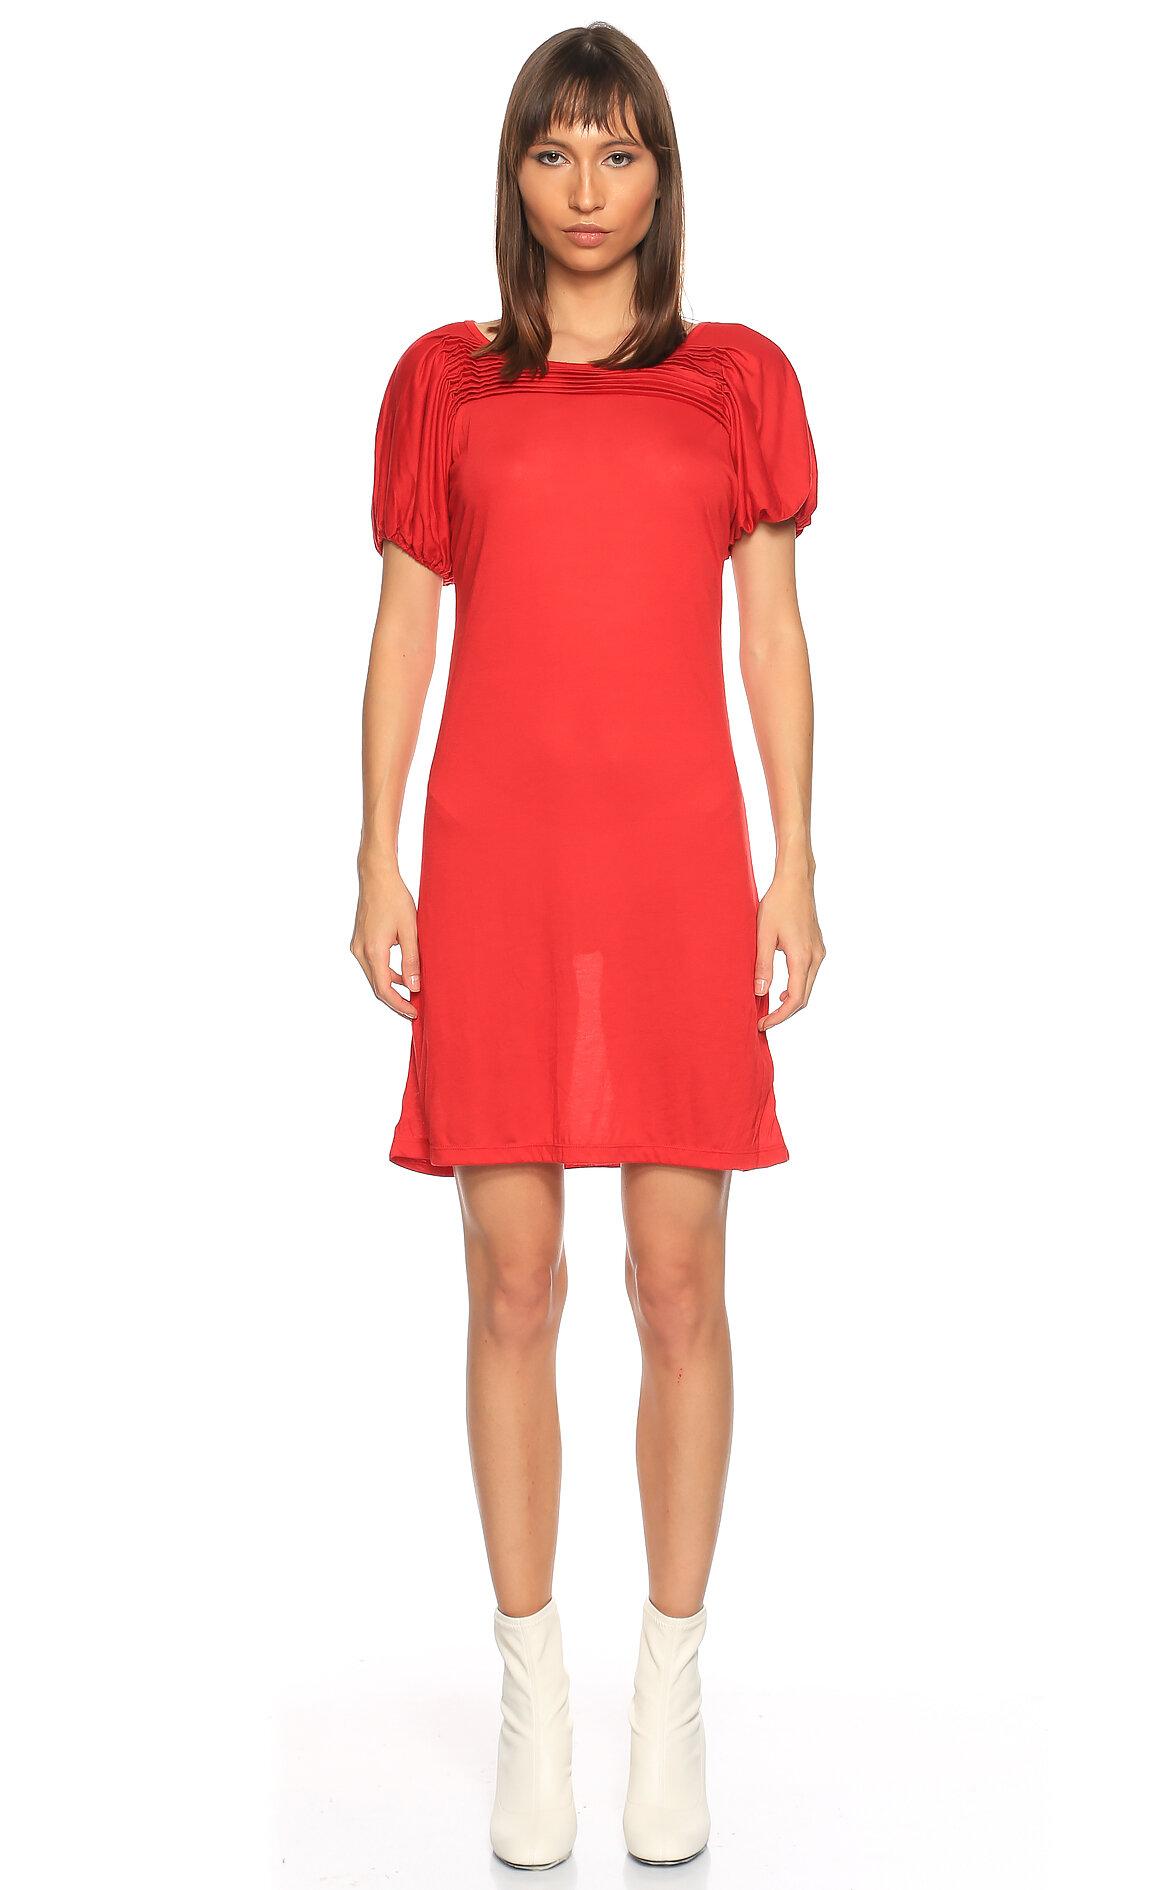 Fornarina Jeans-Fornarina Jeans Diz Üstü Kırmızı Elbise